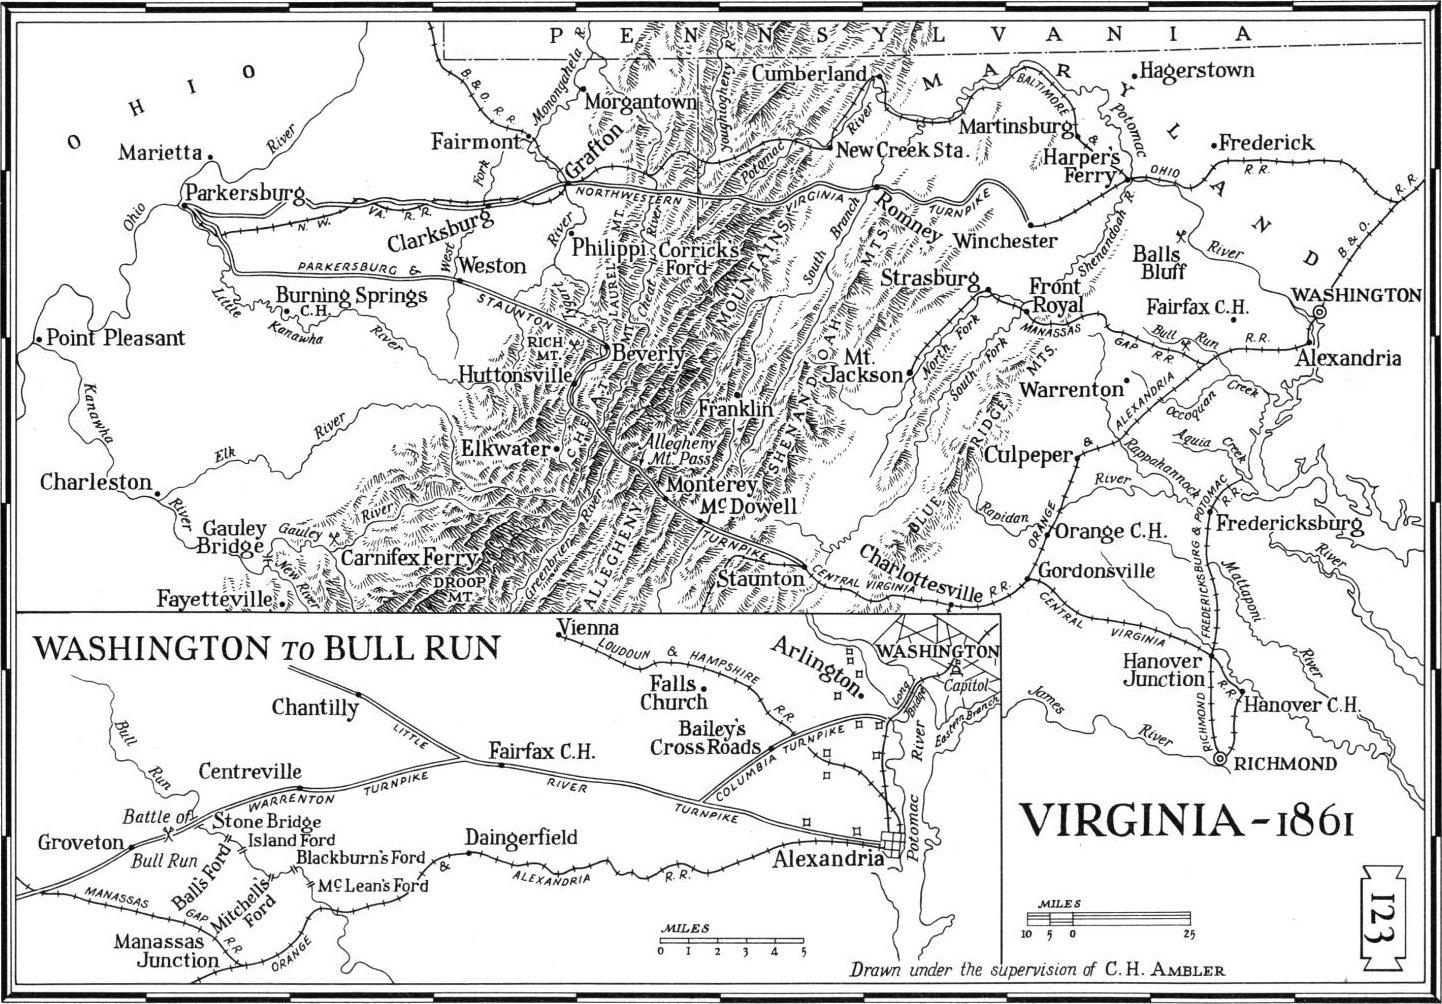 Virginia Maps Virginia Digital Map Library Table Of